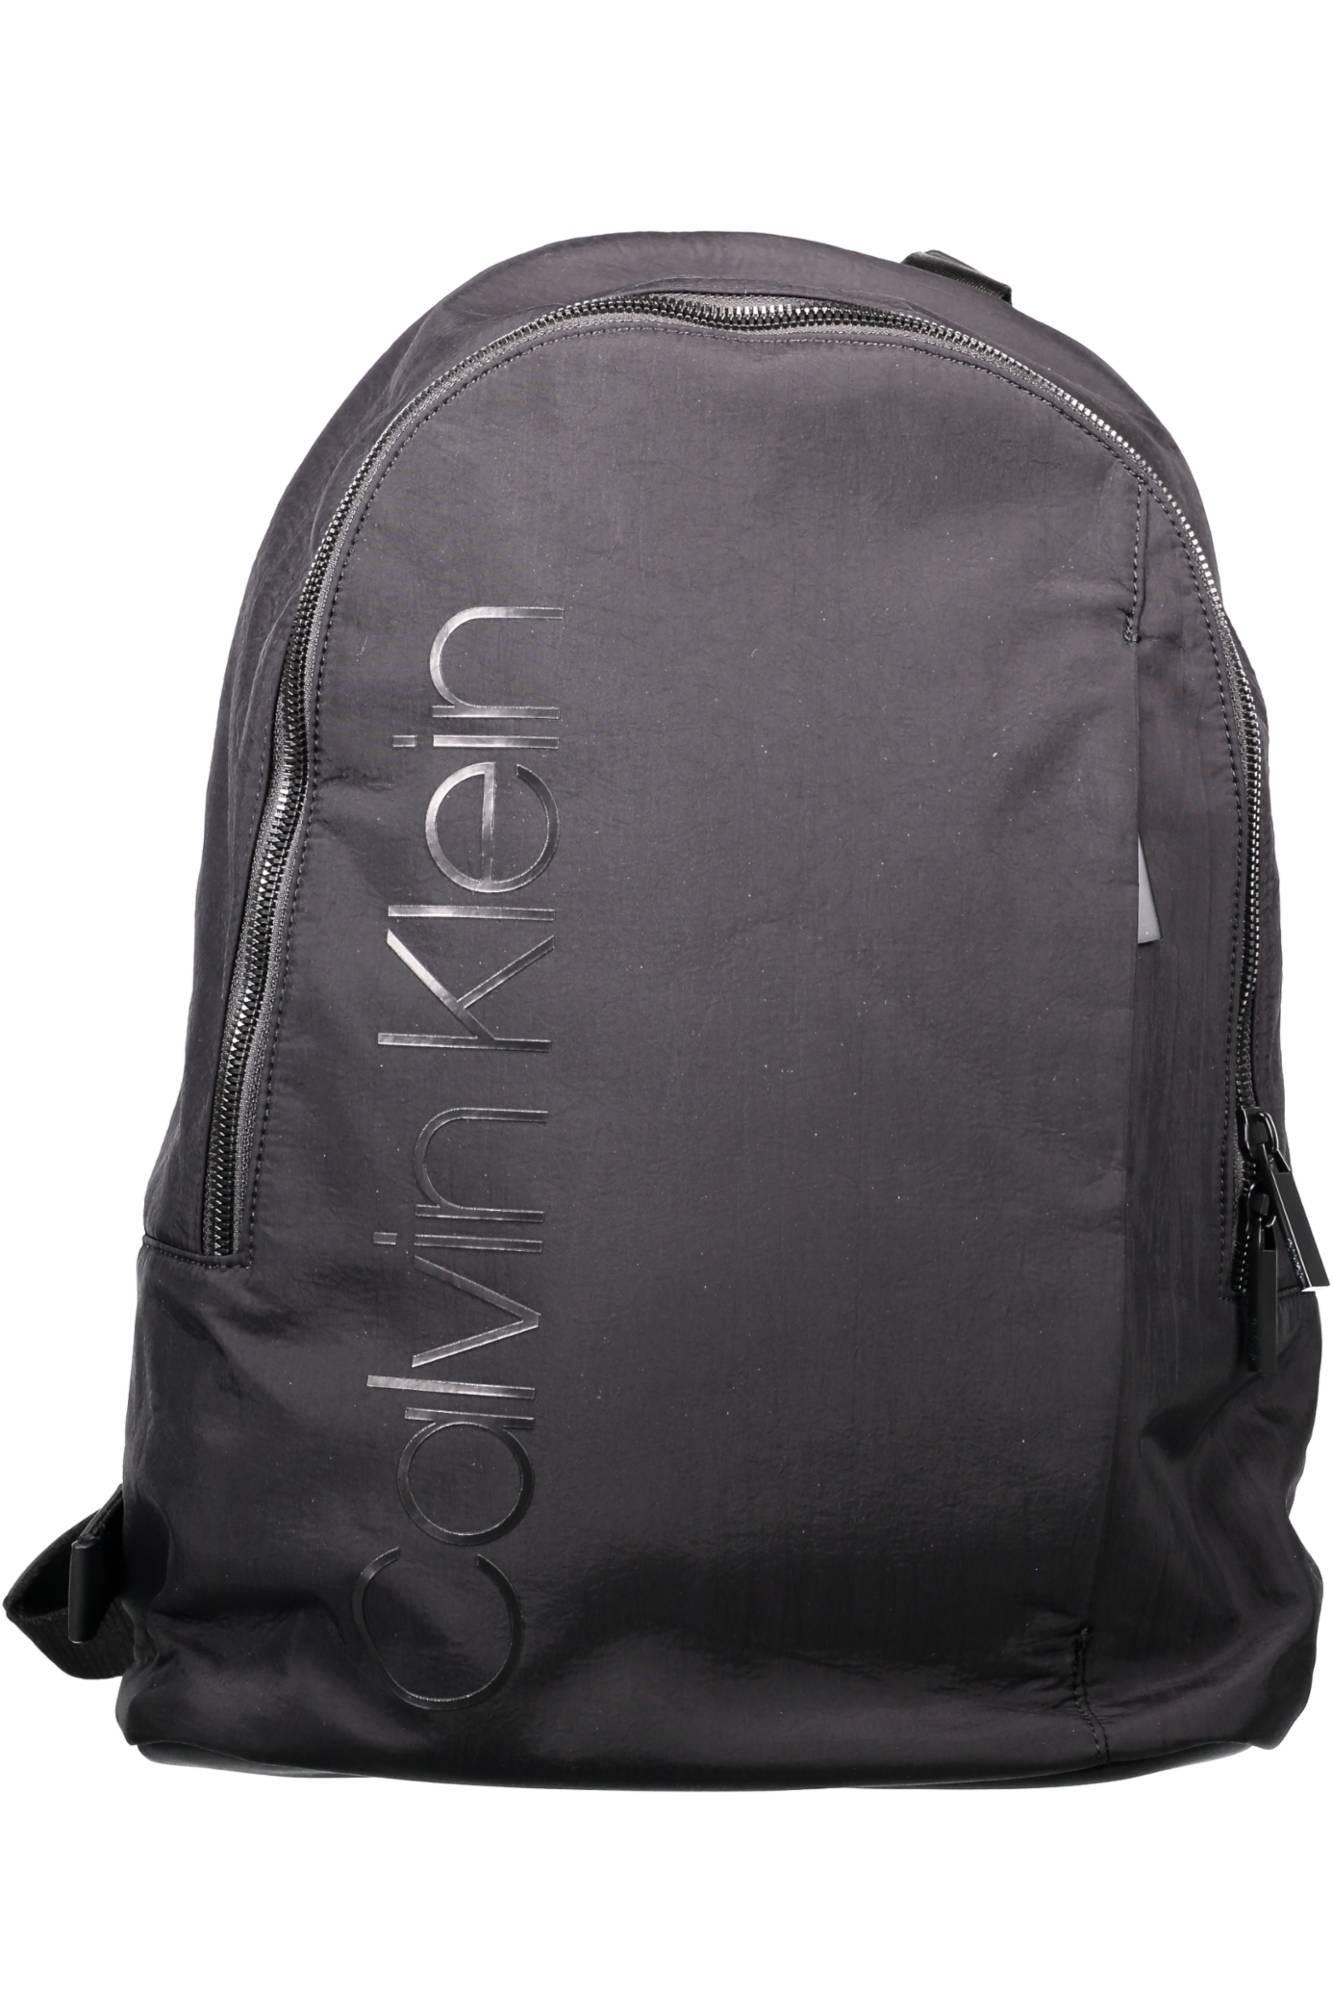 ... Calvin Klein Taška Pánská. -10% -14% cd114376f51